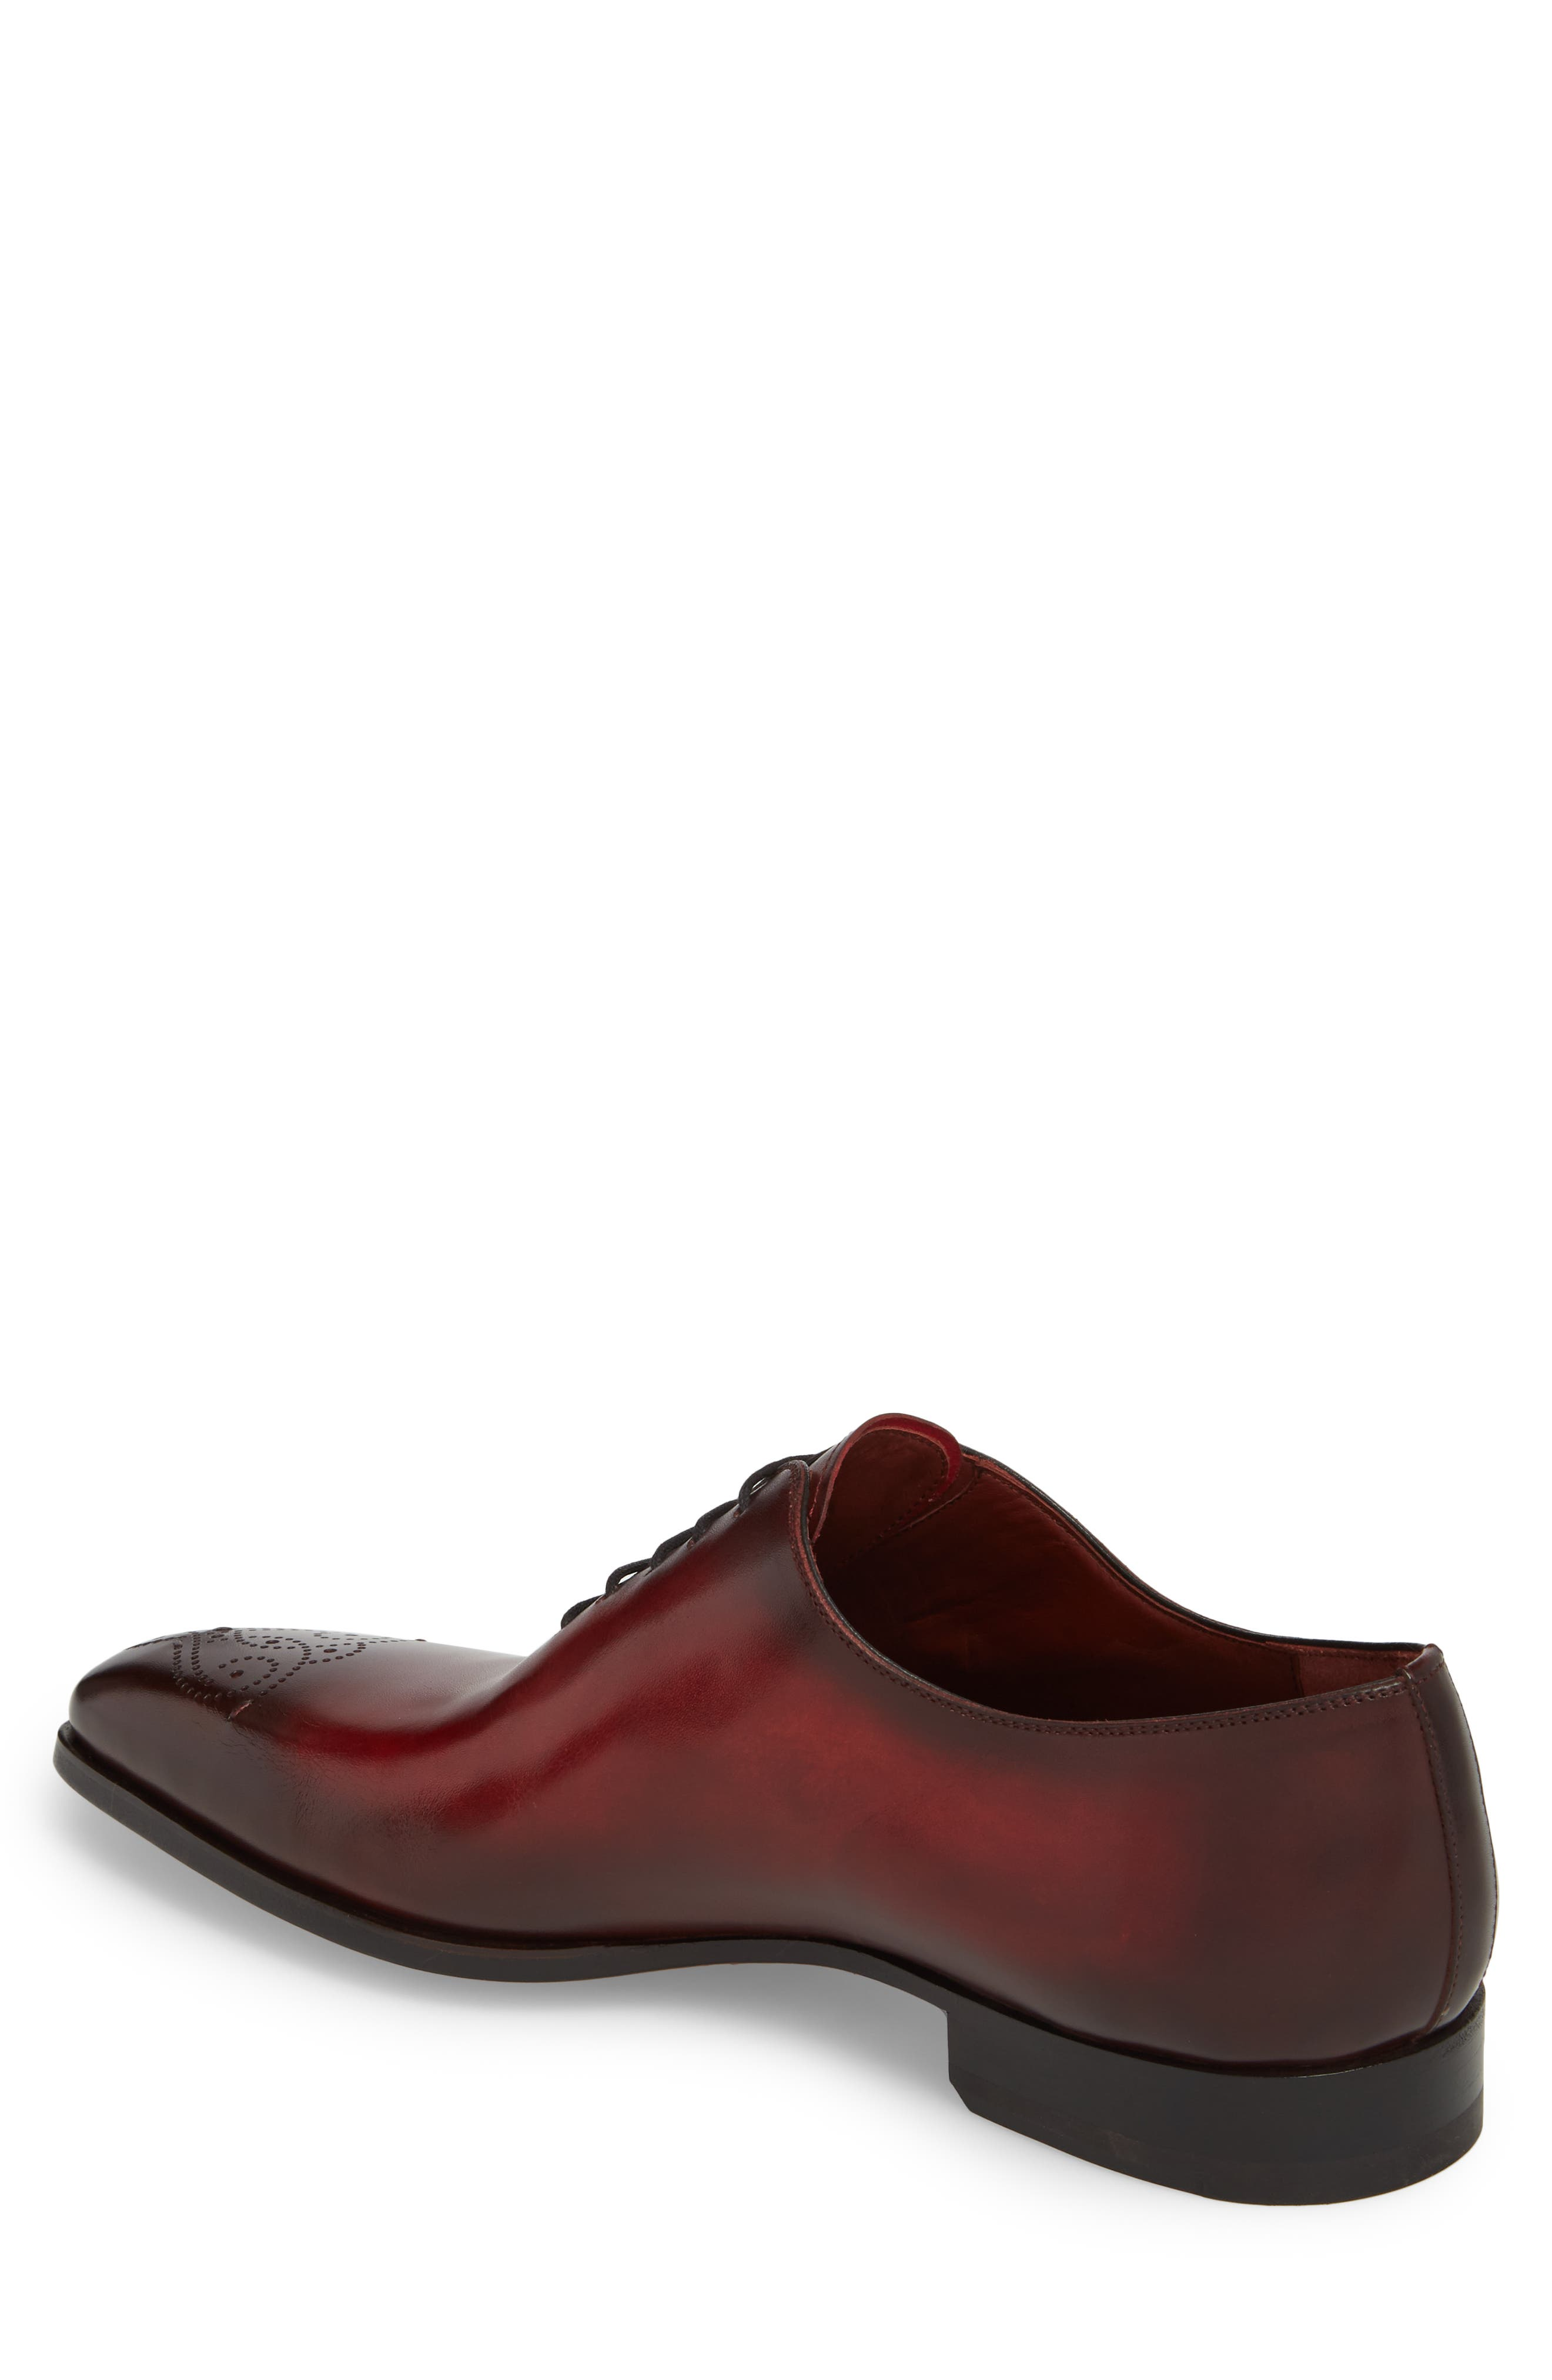 Vada Brogued Whole Cut Shoe,                             Alternate thumbnail 2, color,                             600